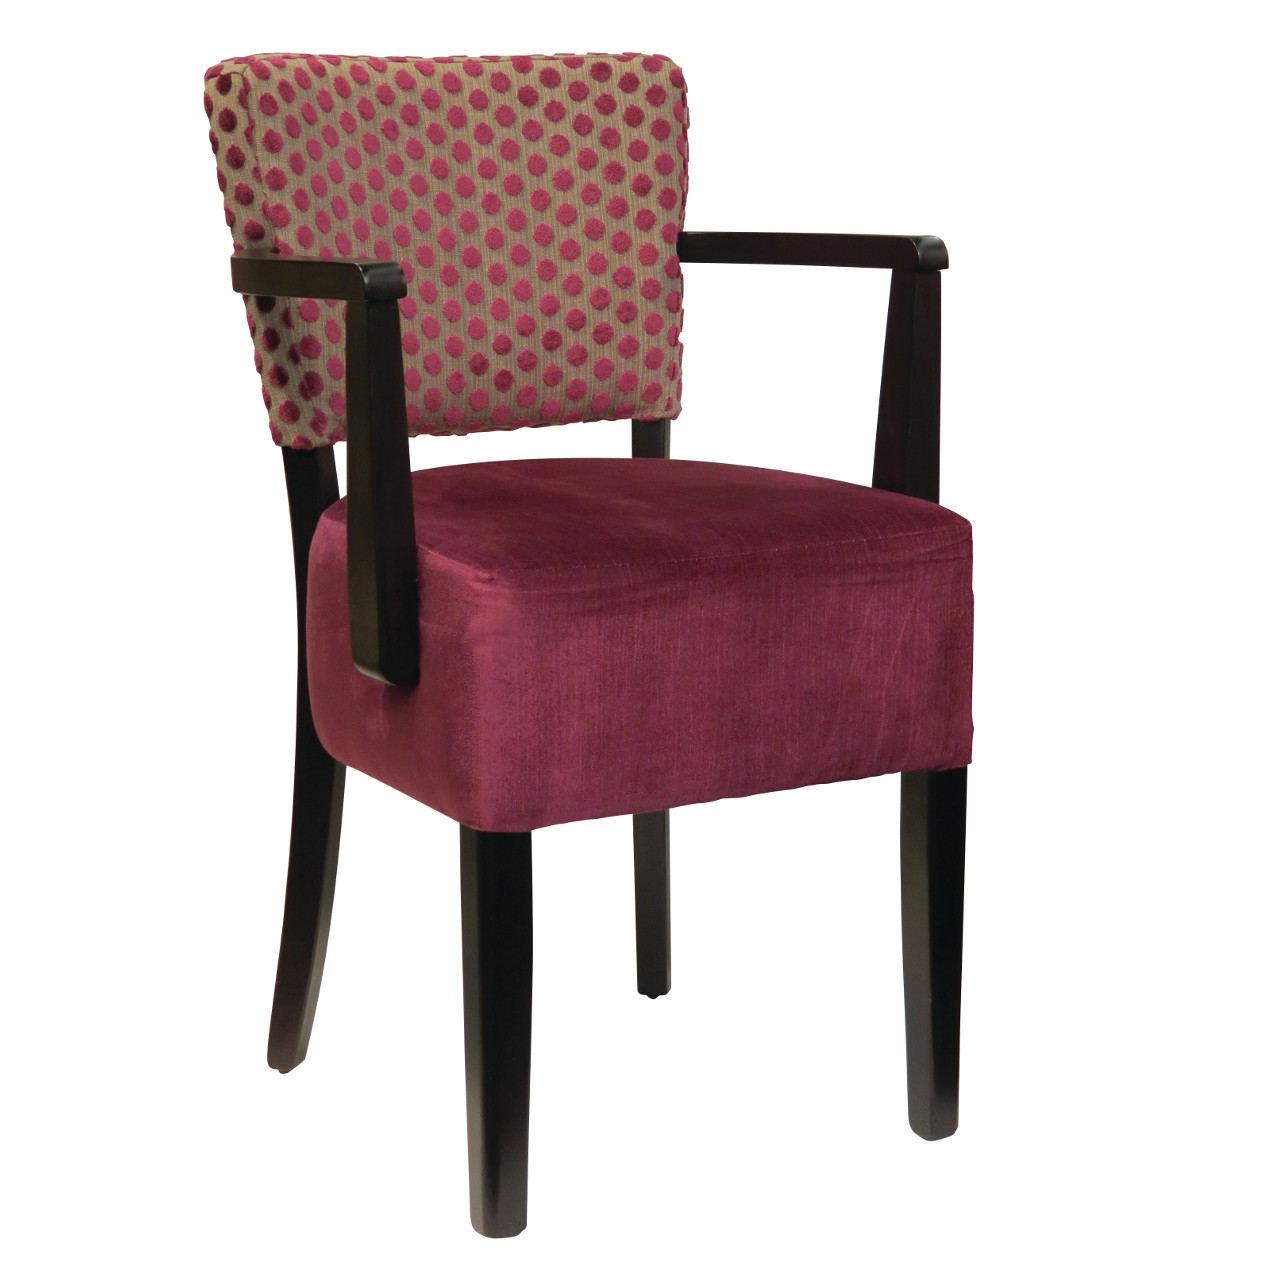 memphis-armchair_1